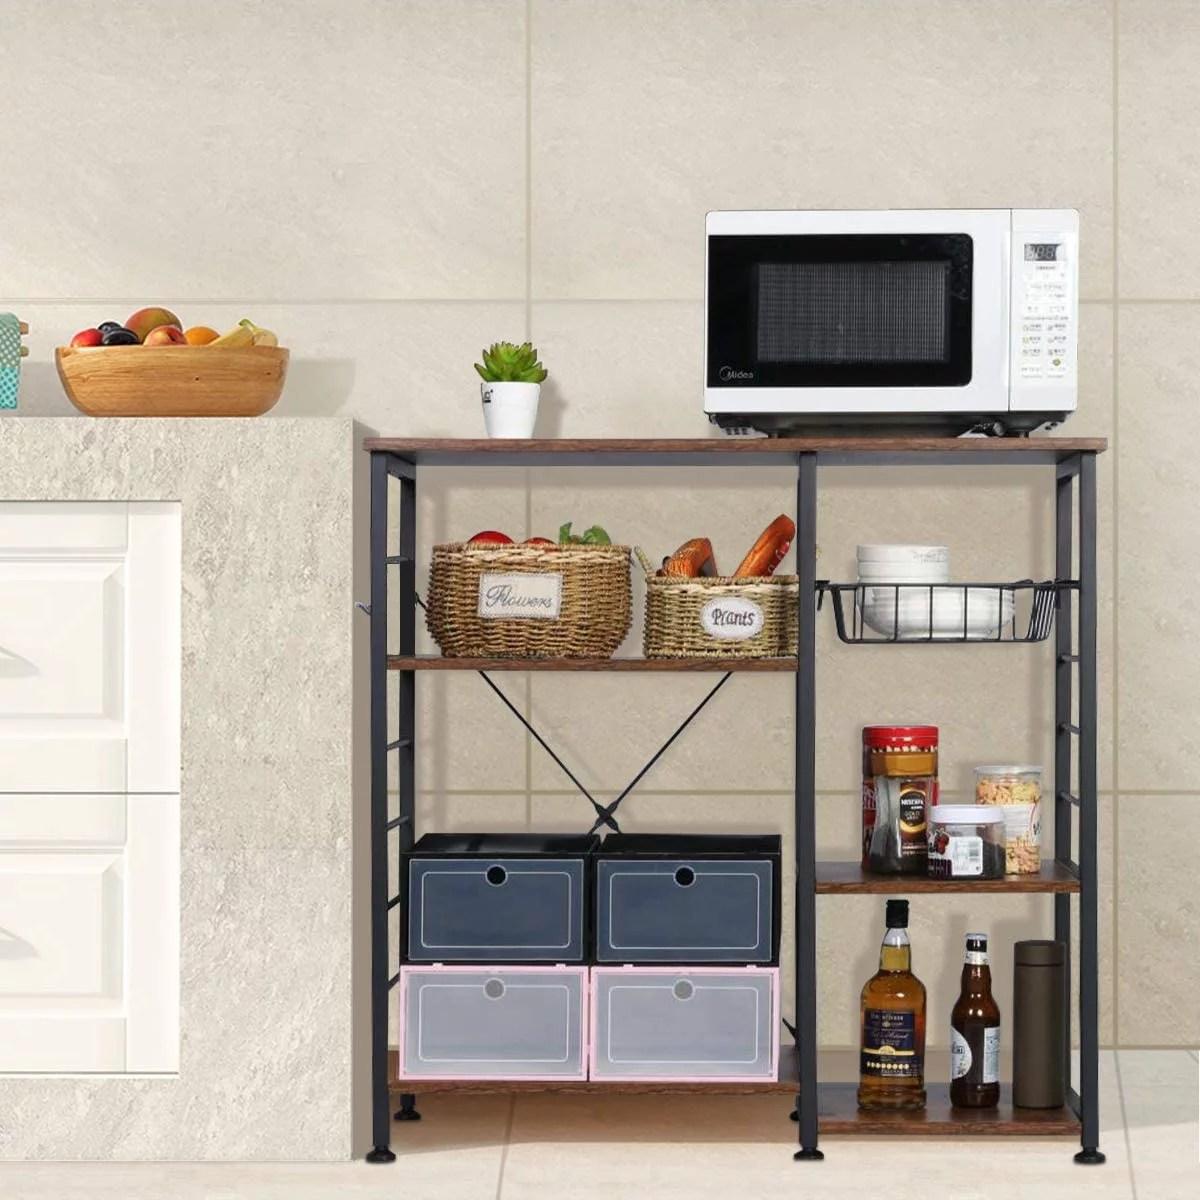 3 tier kitchen bakers rack home storage rack utility microwave oven stand shelf kitchen organizer rack walmart com